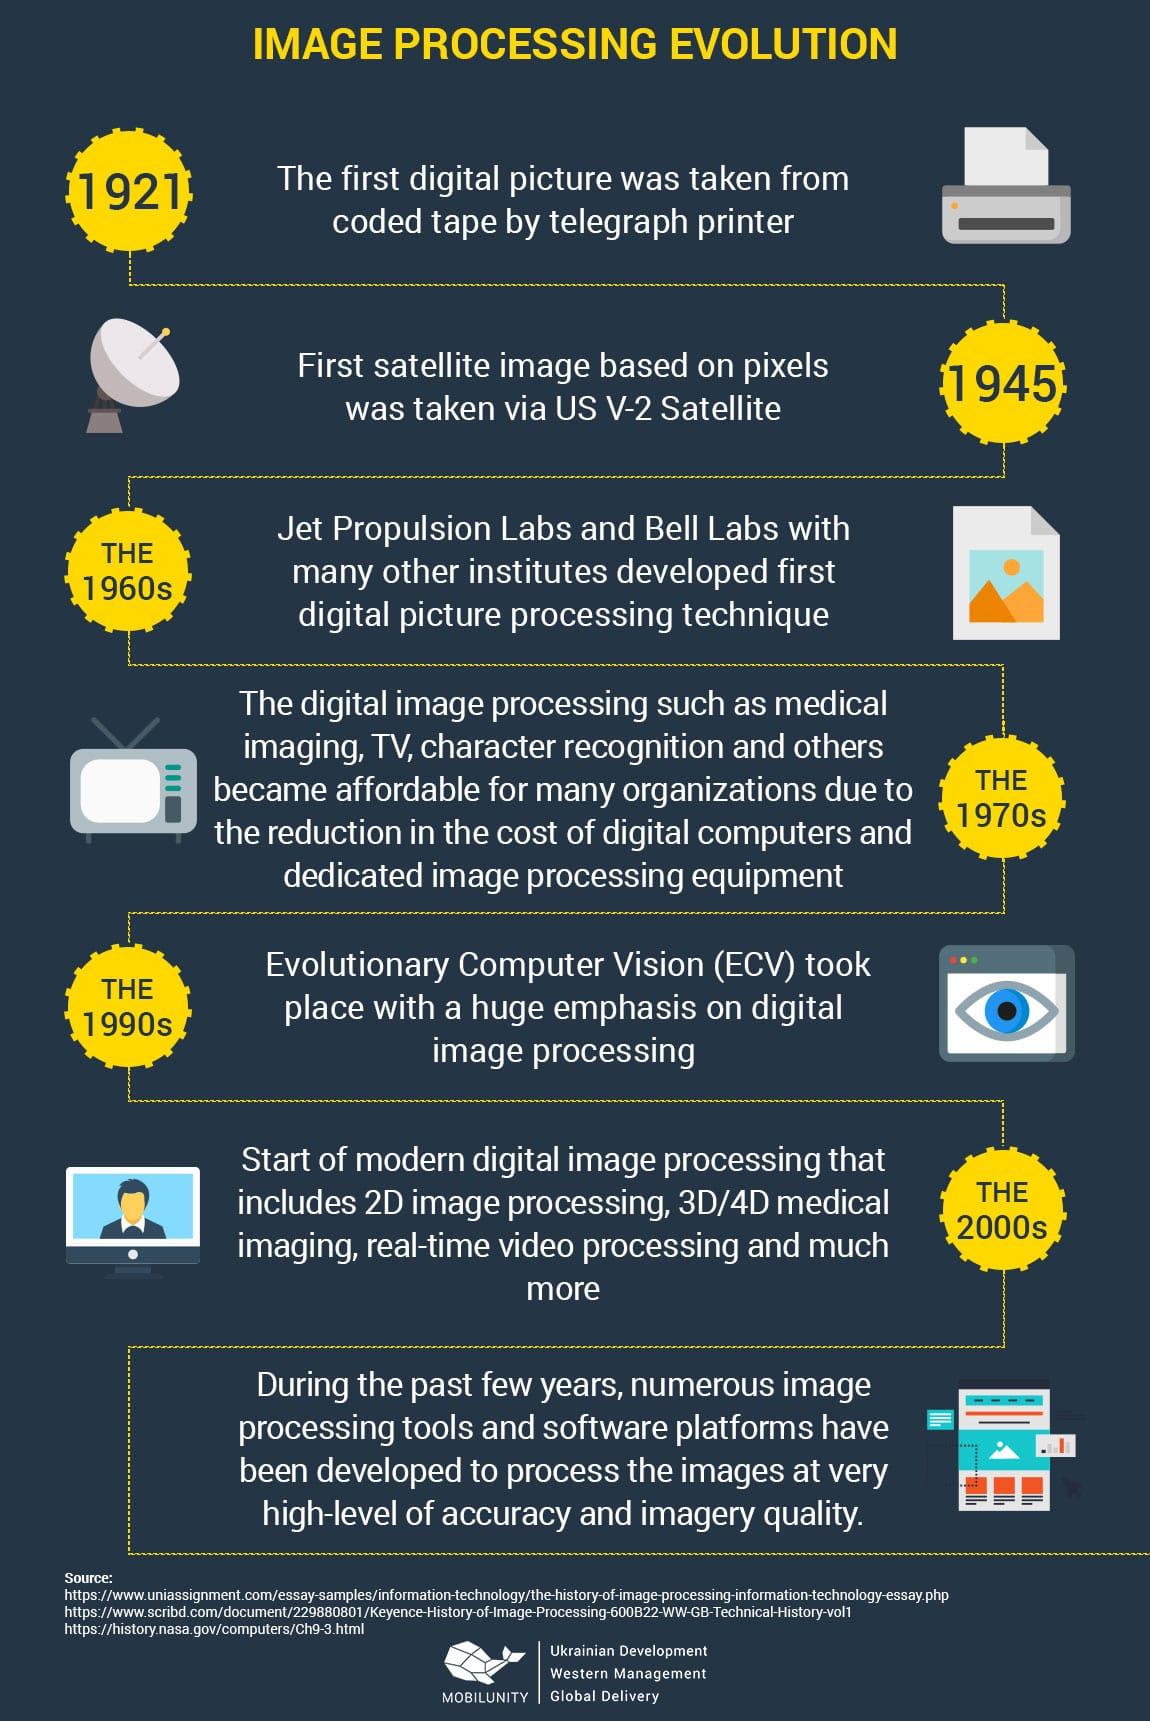 image processing evolution